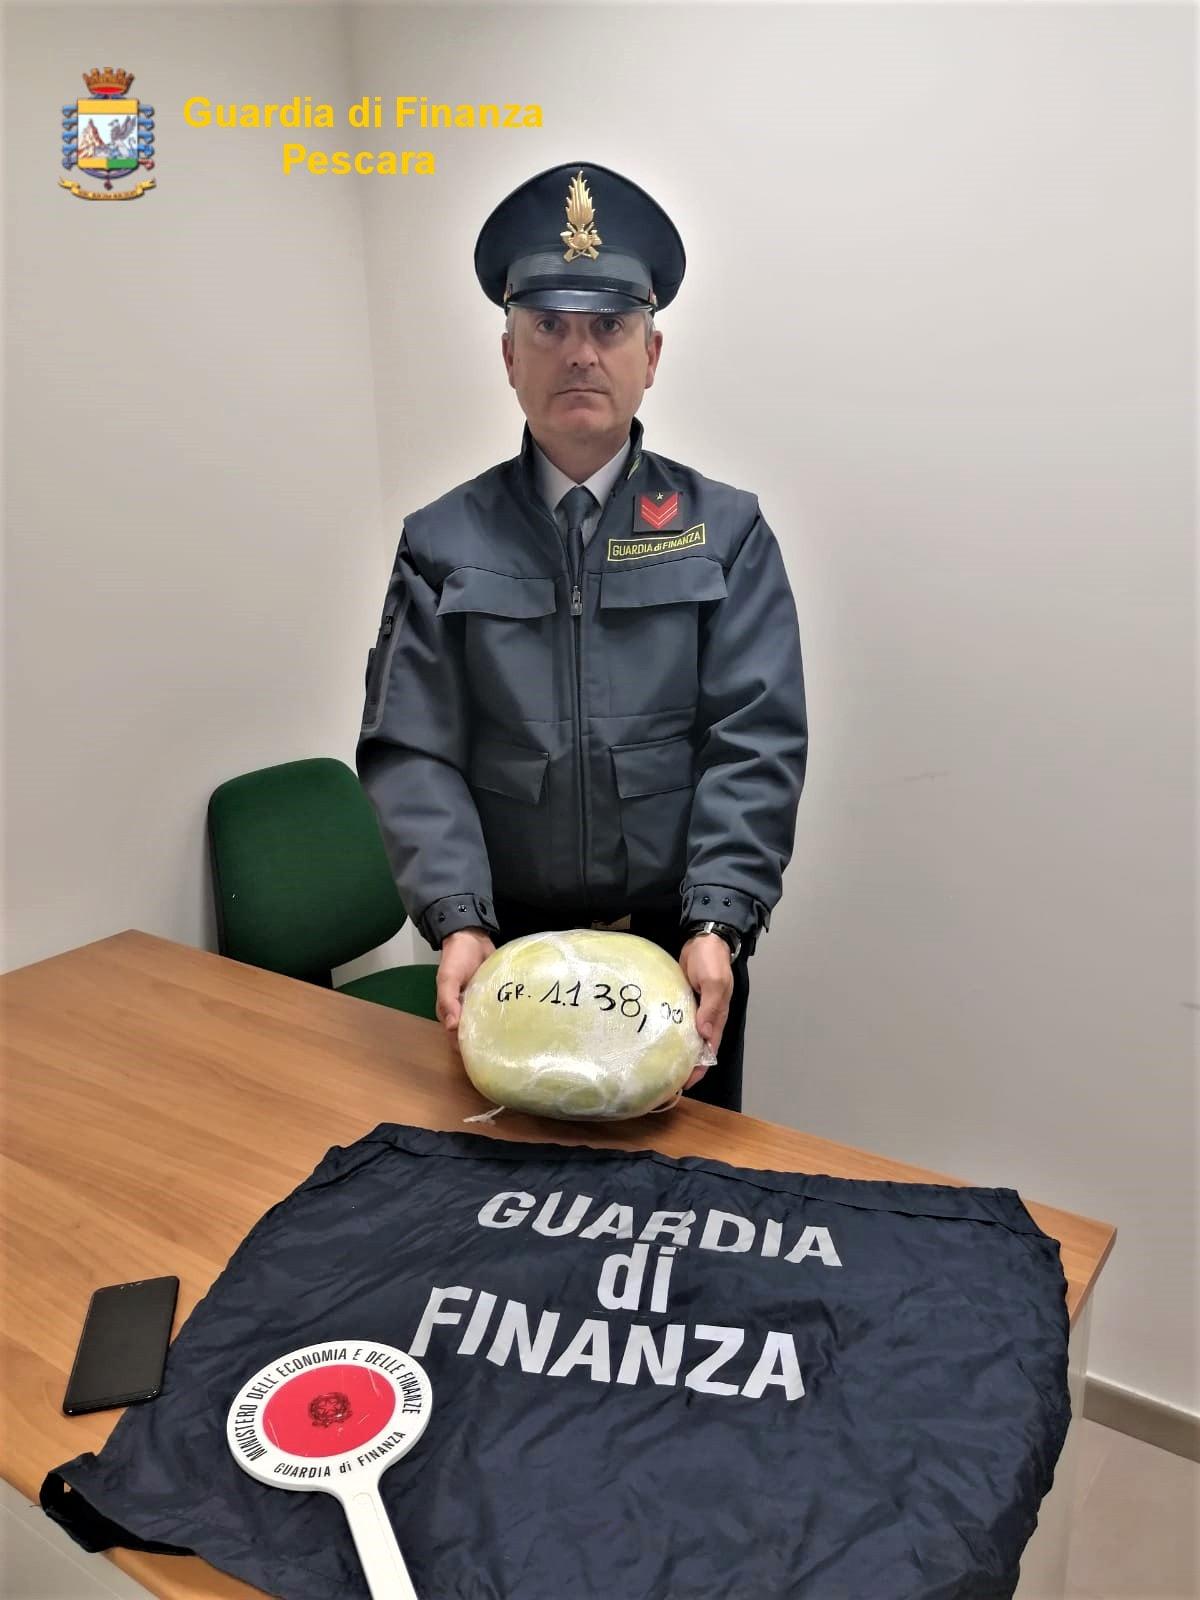 arresto droga marijuana guardia finanza ponte flaiano (2)-2